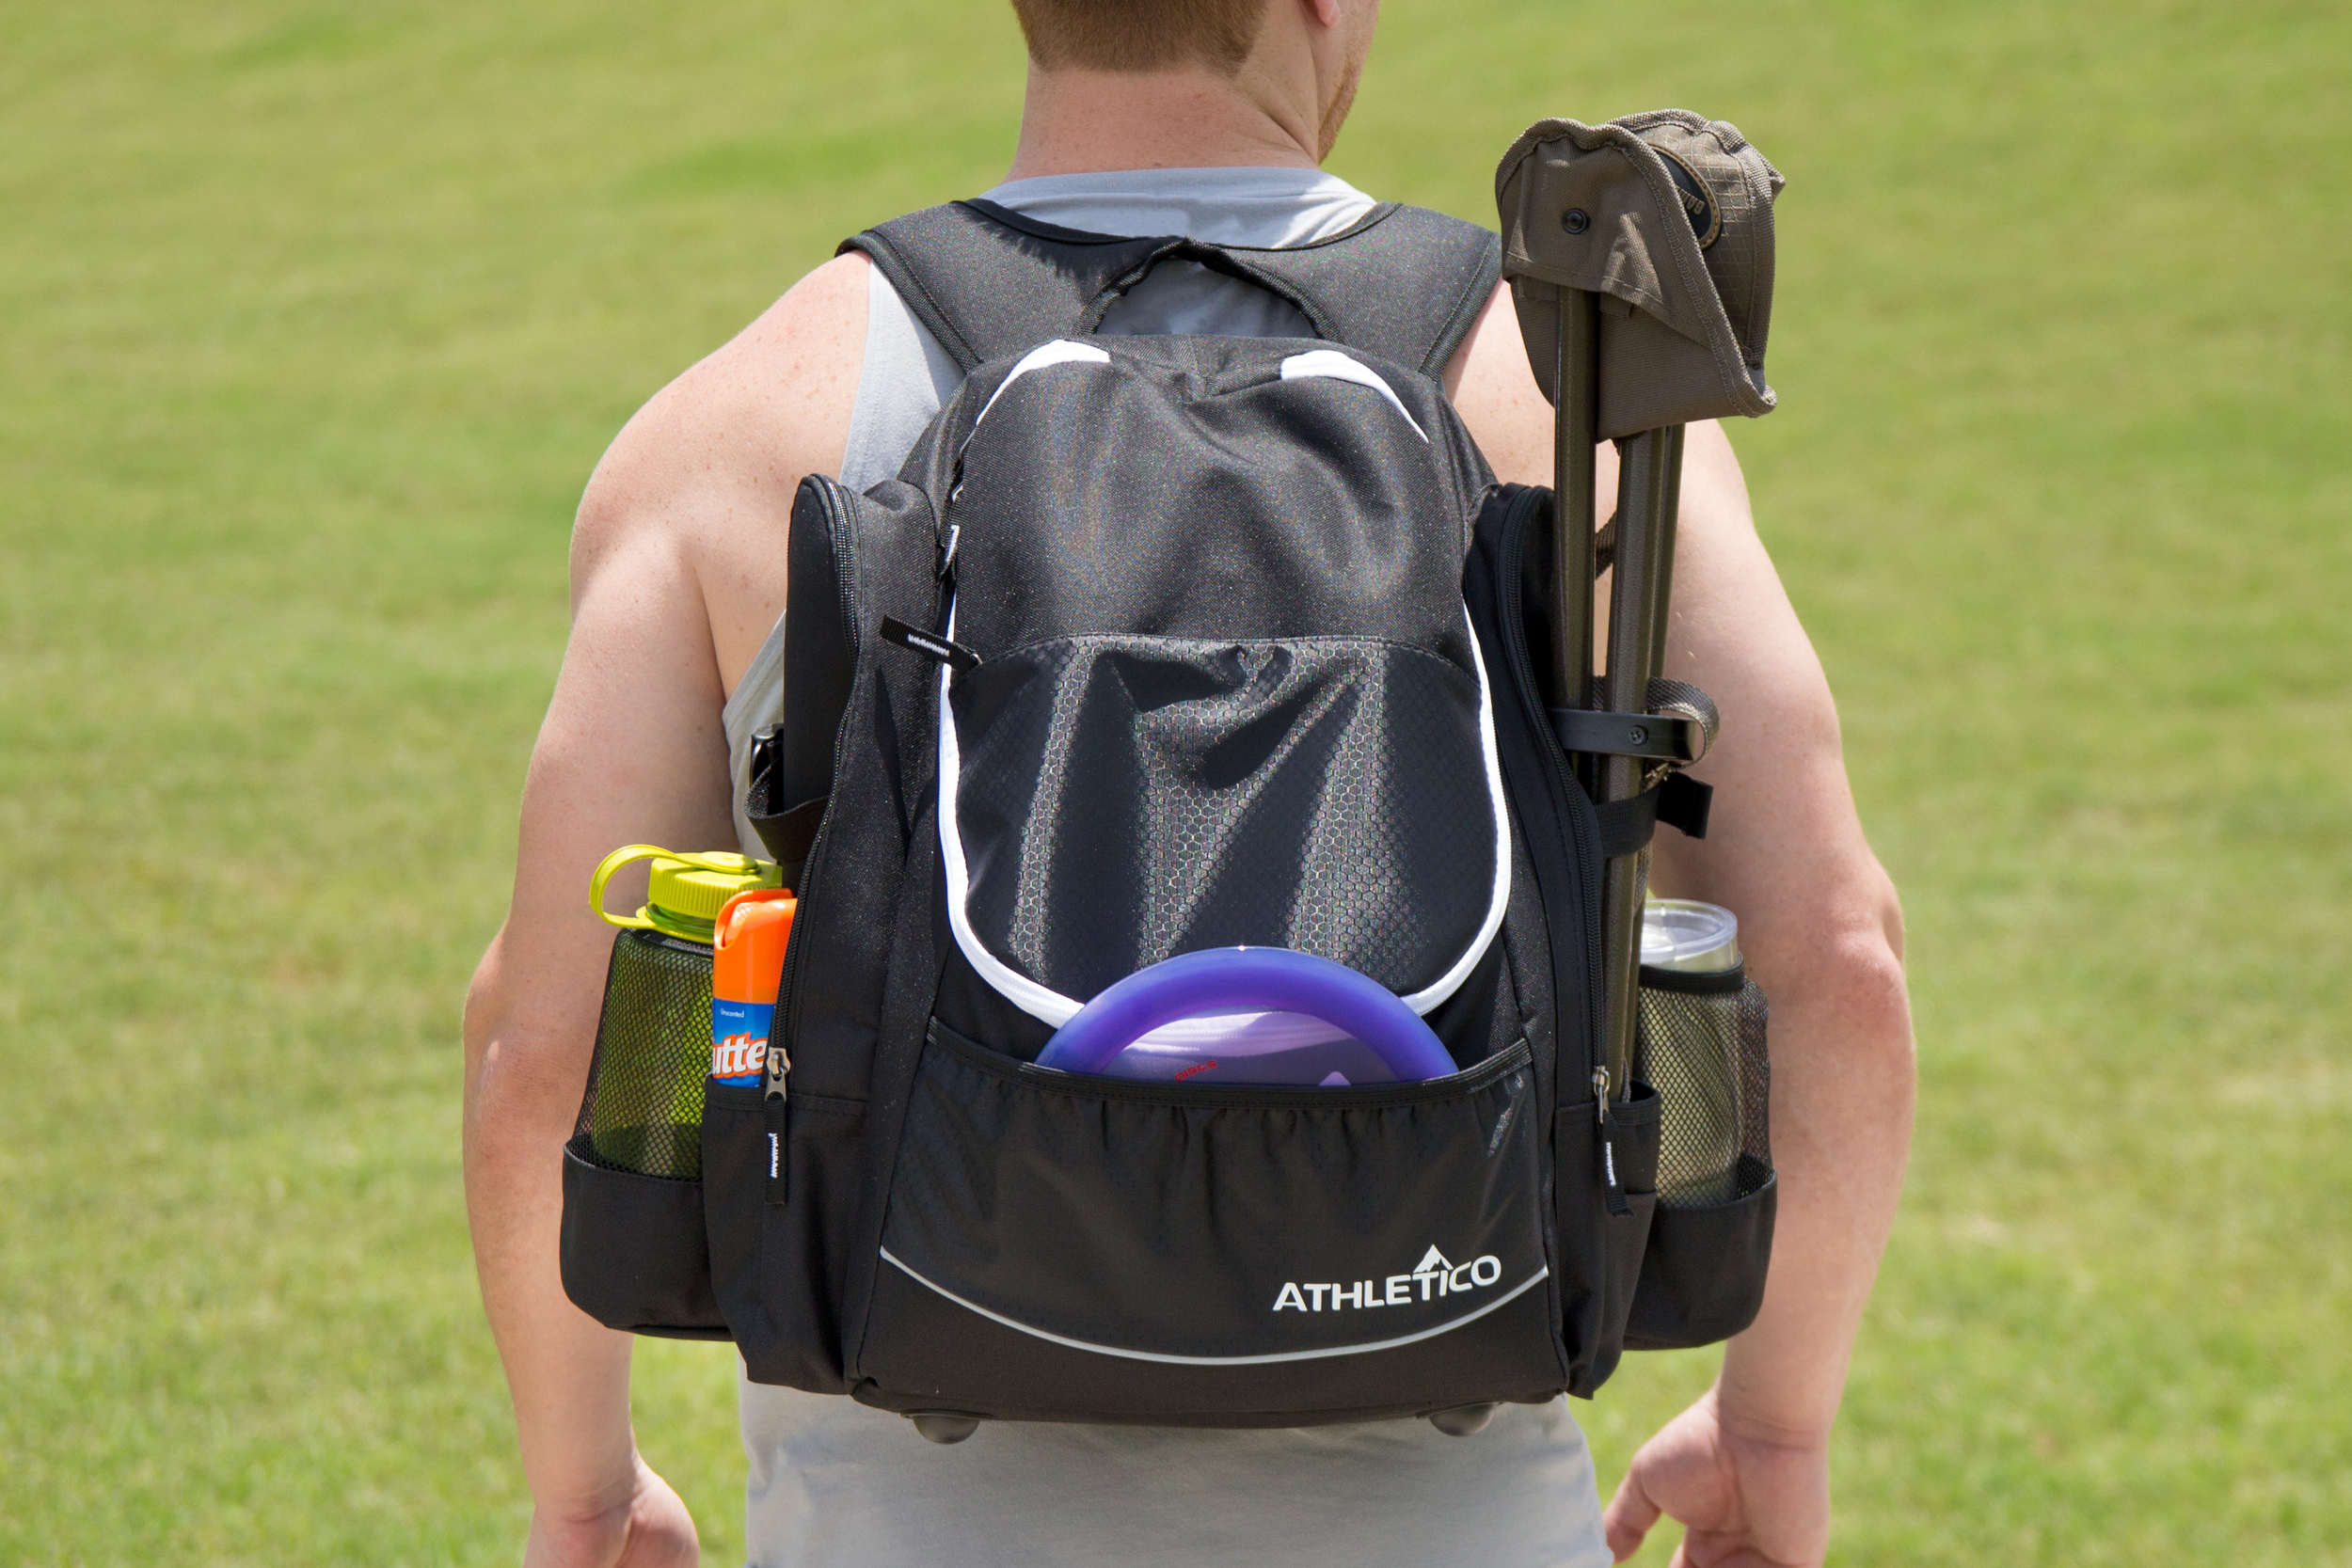 Athletico-Disc-Golf-Bag-11.png